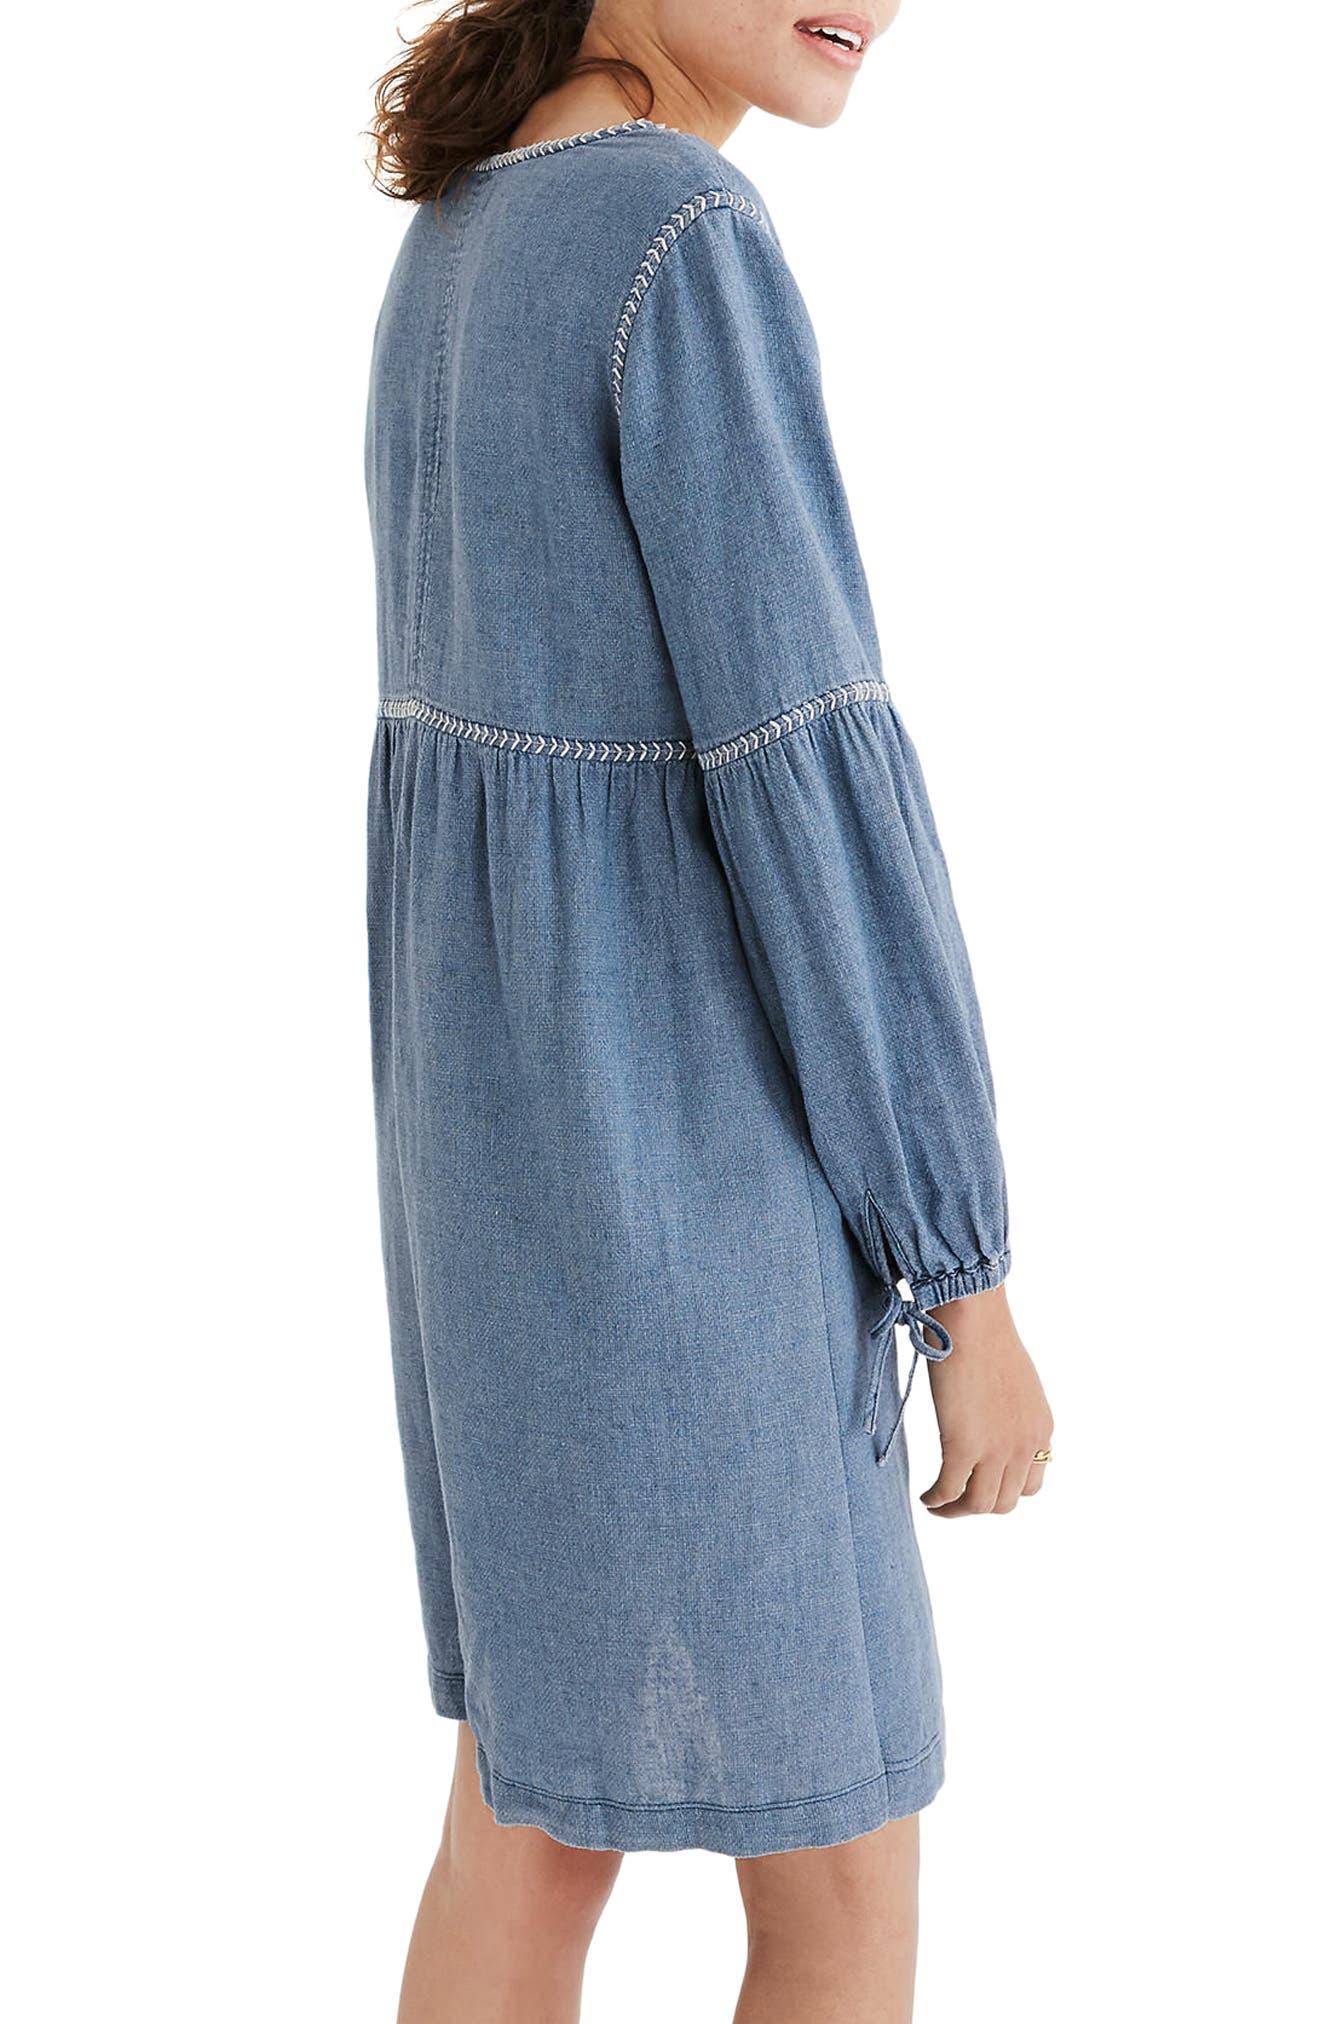 Indigo Peasant Dress,                             Alternate thumbnail 2, color,                             400